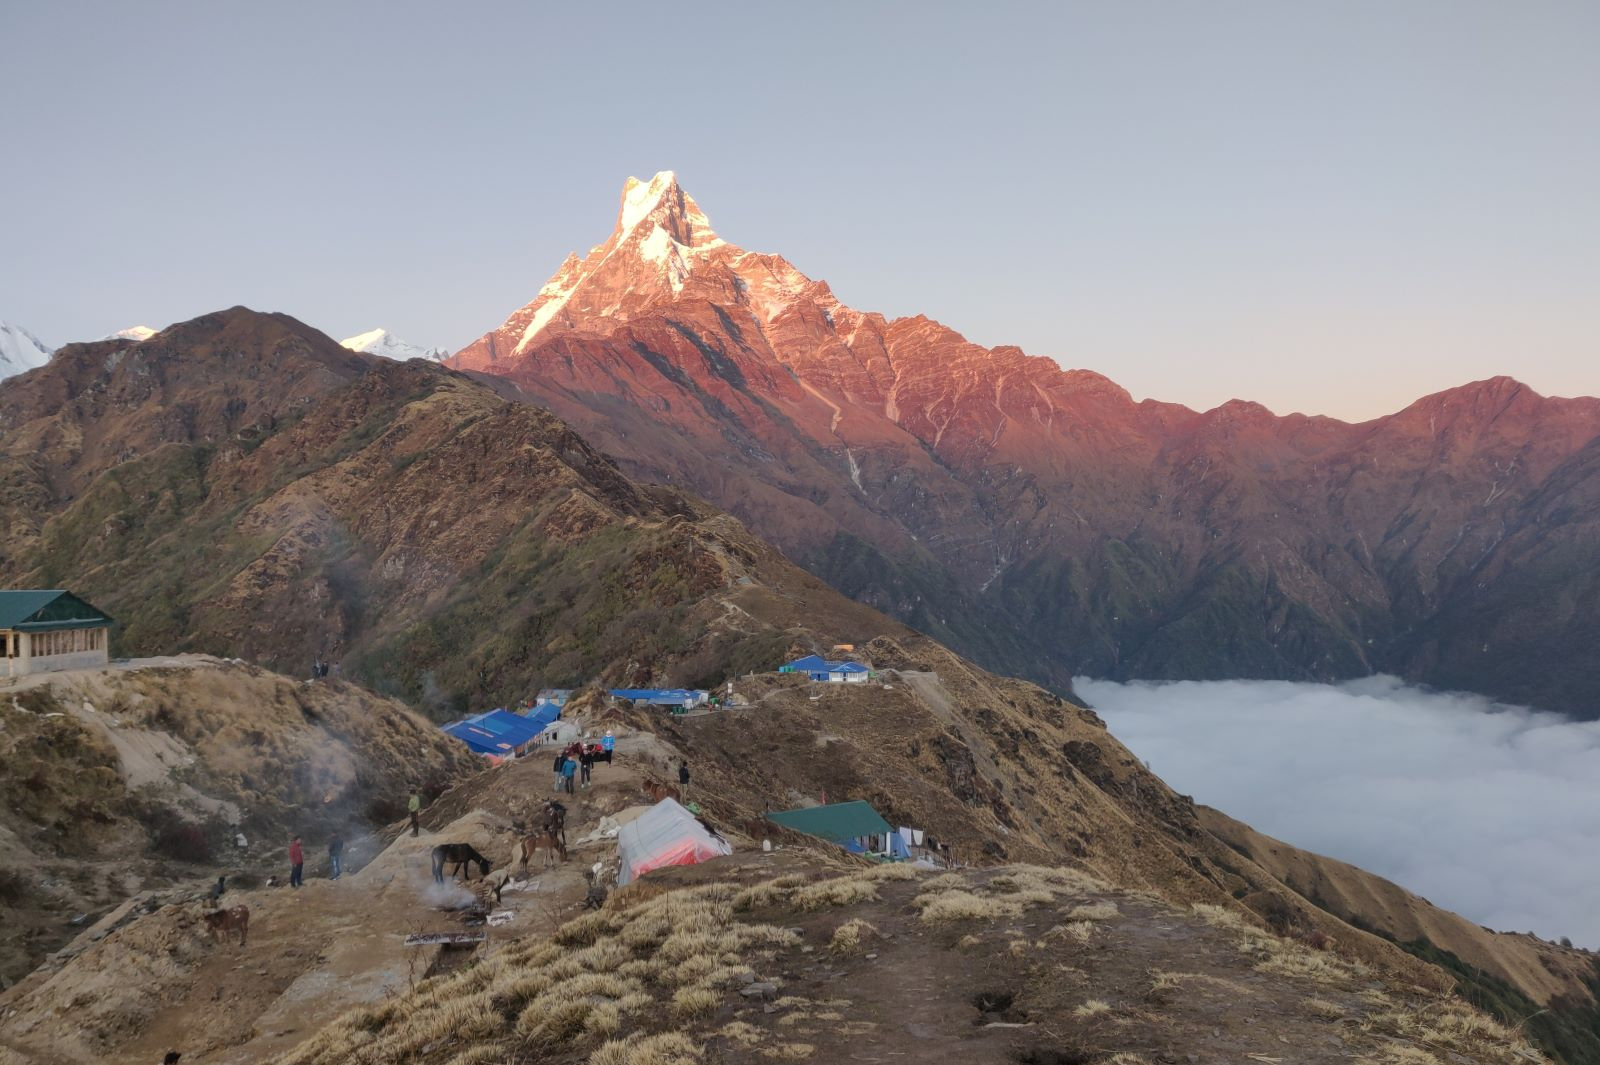 Mardi Himal trek - Machapuchare - High Camp - fot. Tadeusz Szymanowski